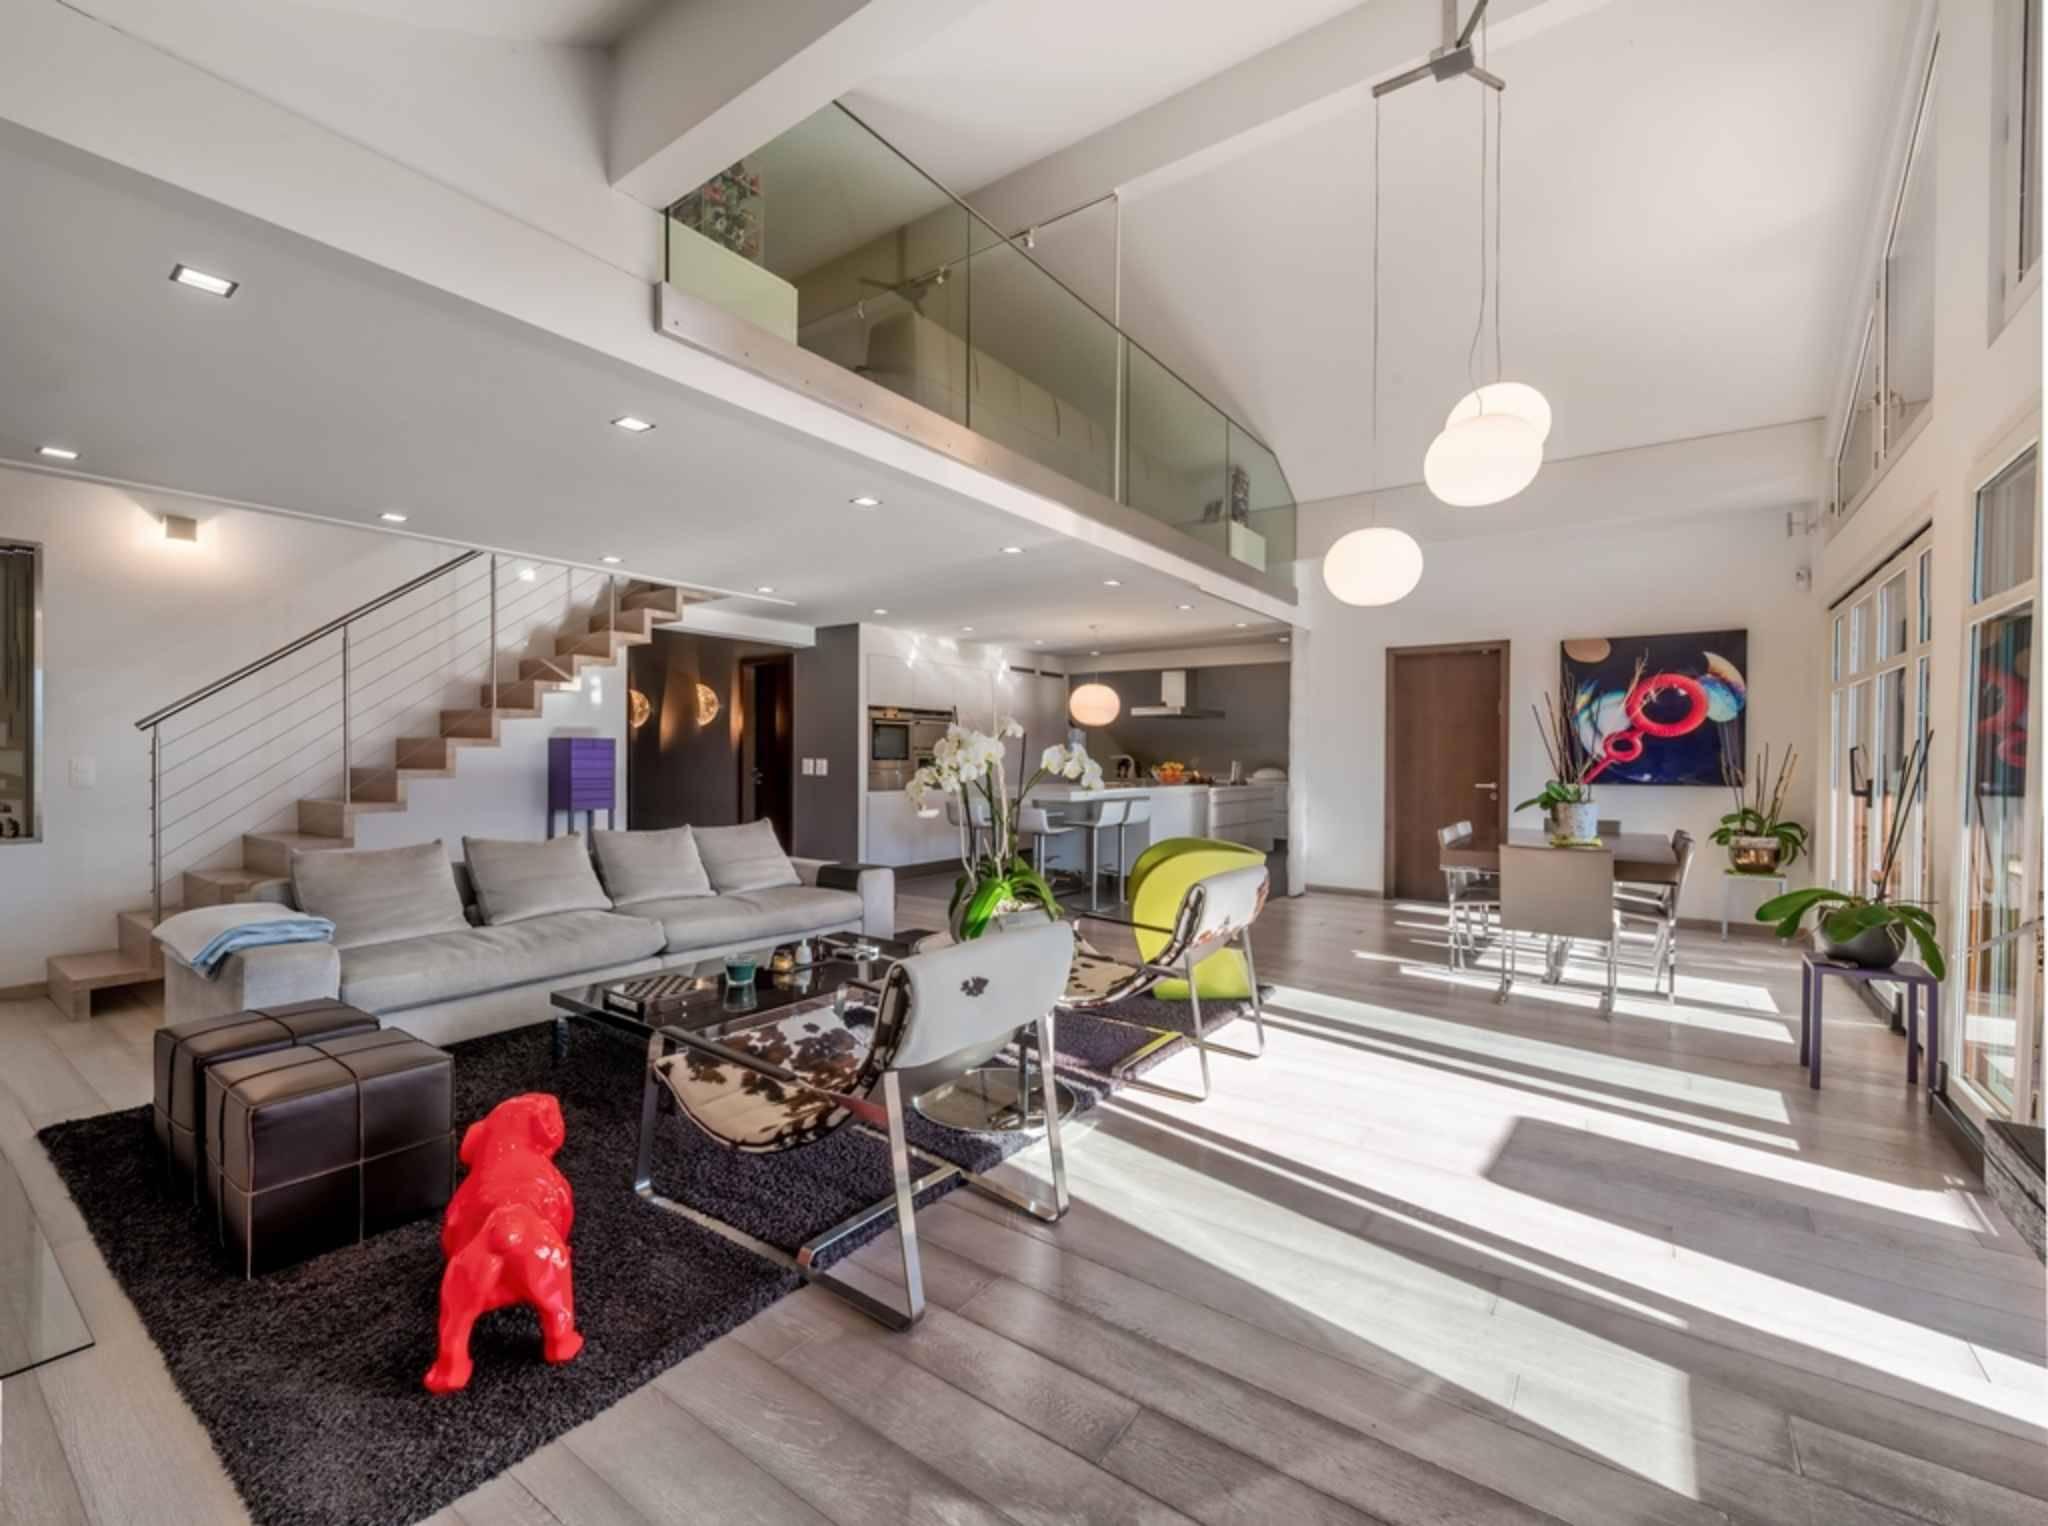 Magnificent 8-room duplex